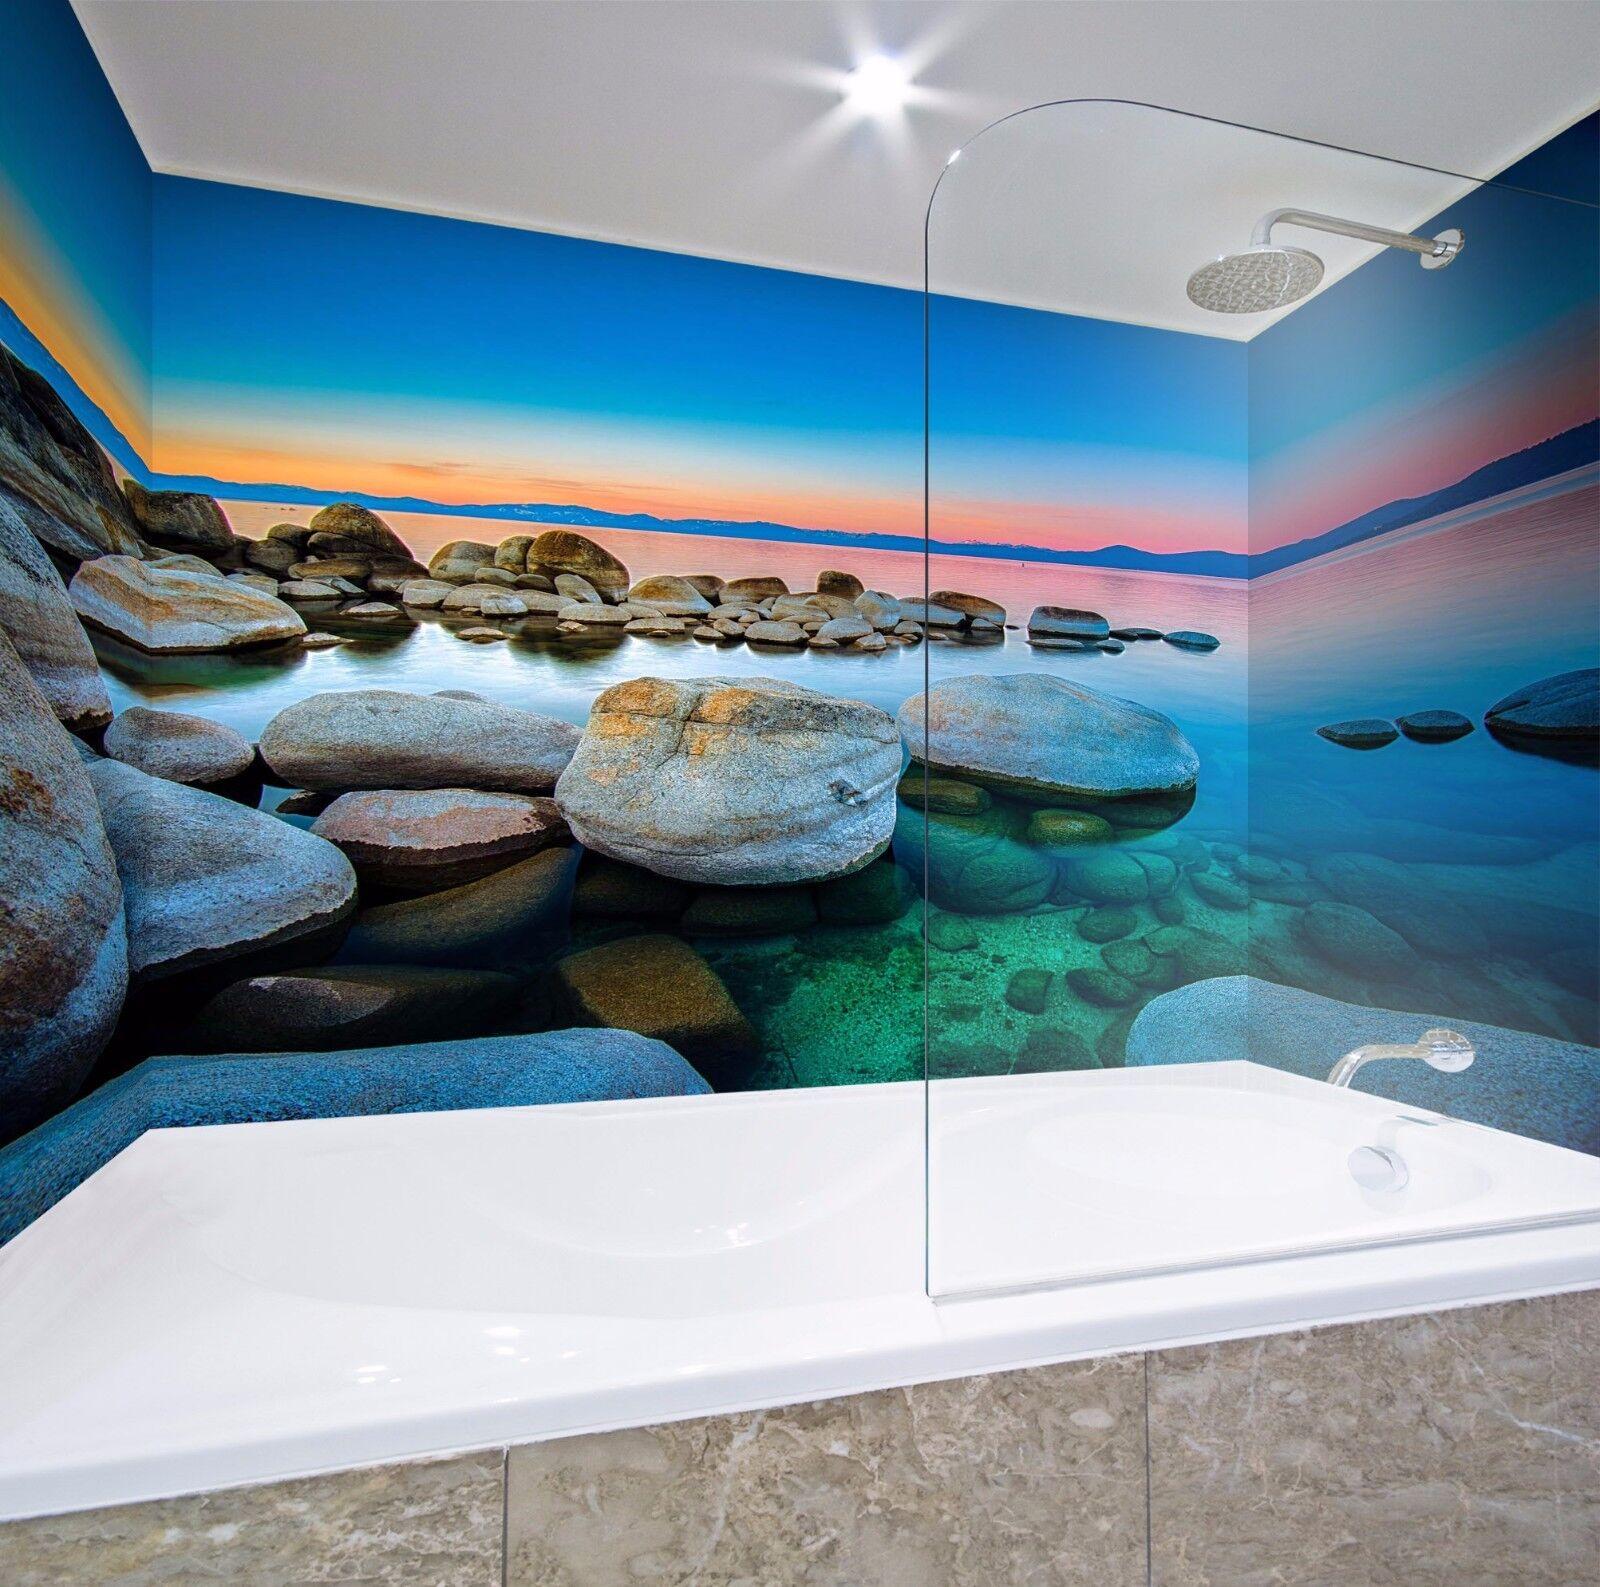 3D Sunset Sea 547 WallPaper Bathroom Print Decal Wall Deco AJ WALLPAPER AU